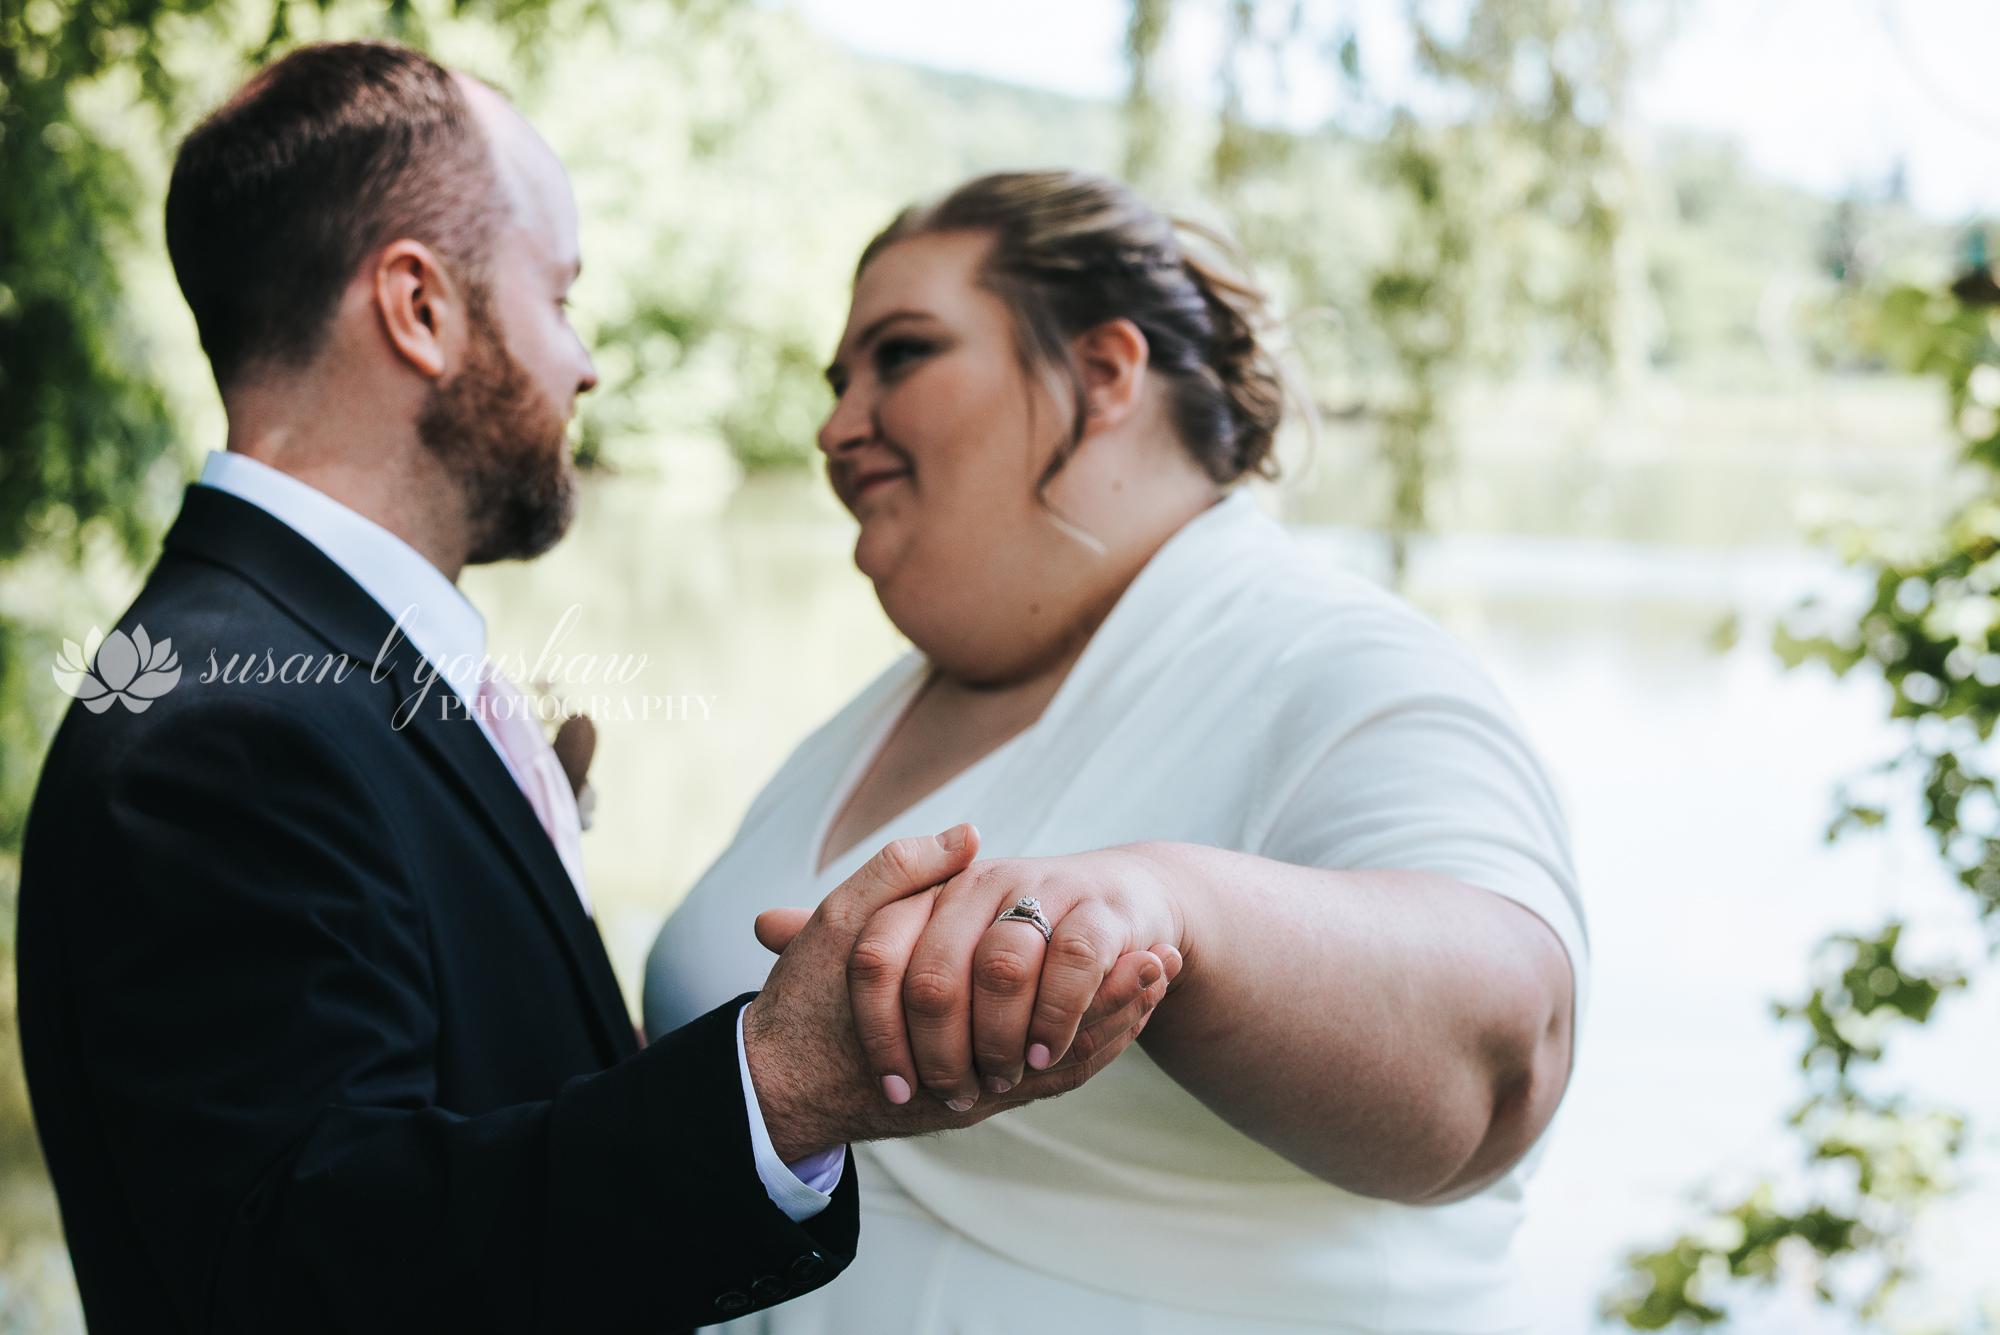 Bill and Sarah Wedding Photos 06-08-2019 SLY Photography -67.jpg